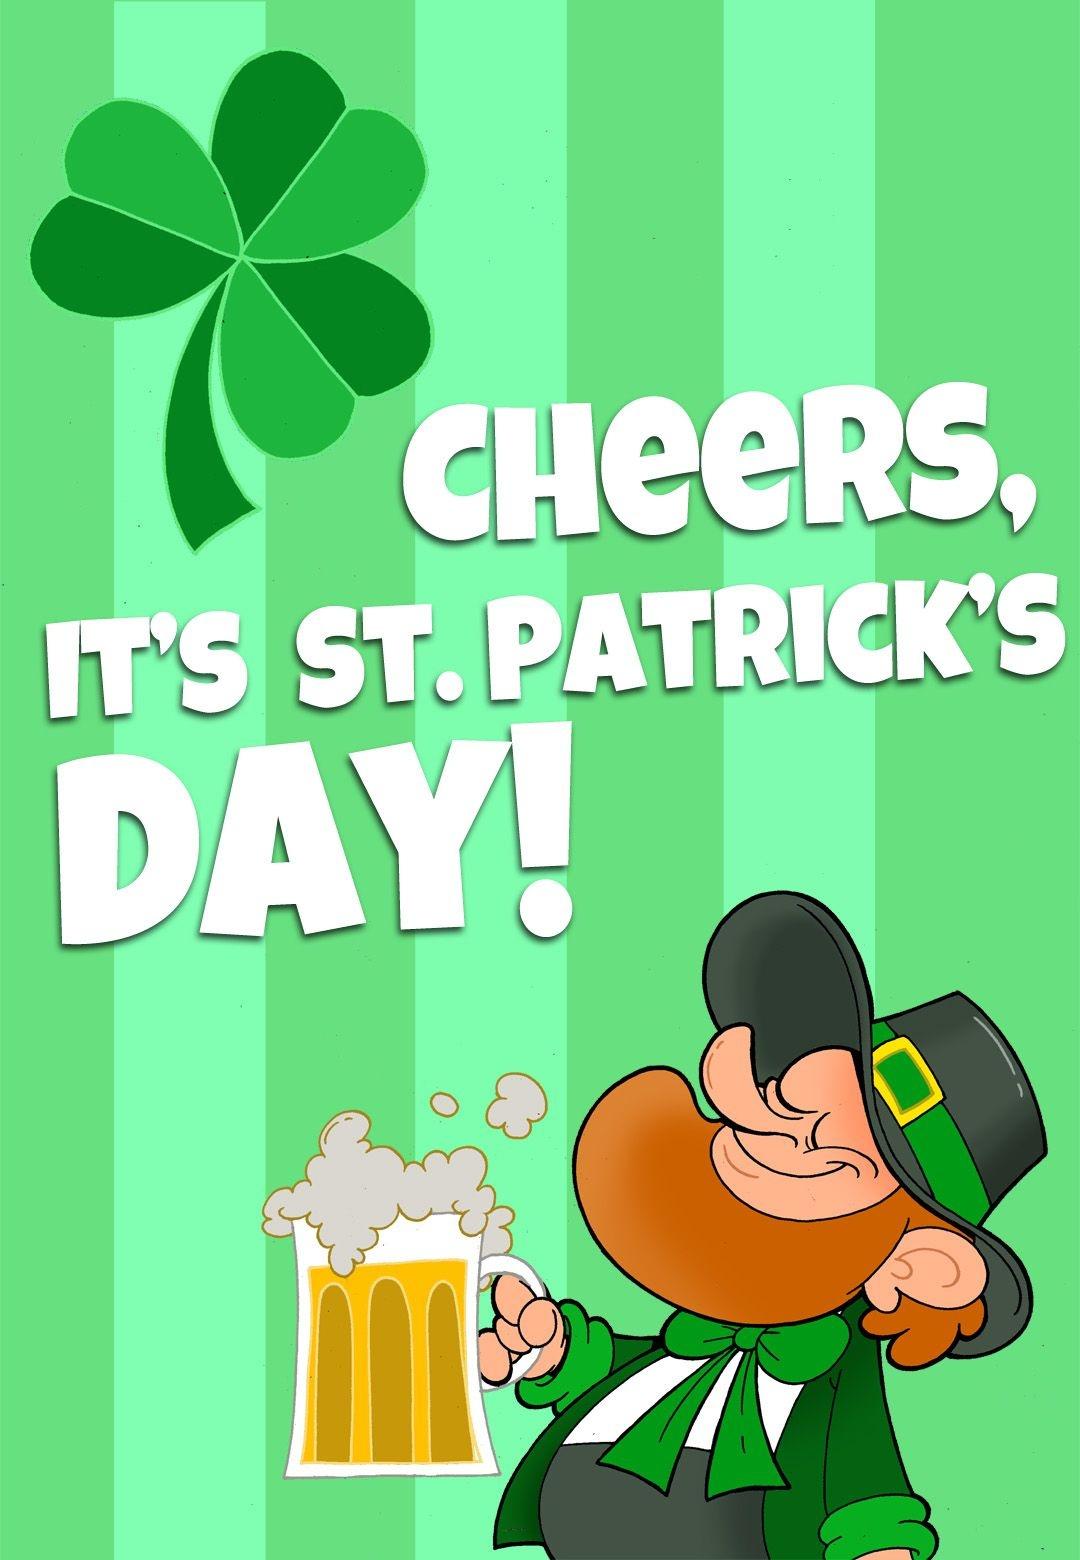 Free Printable 'its St Patricks Day' Greeting Card | Printable St - Free Printable St Patrick's Day Card